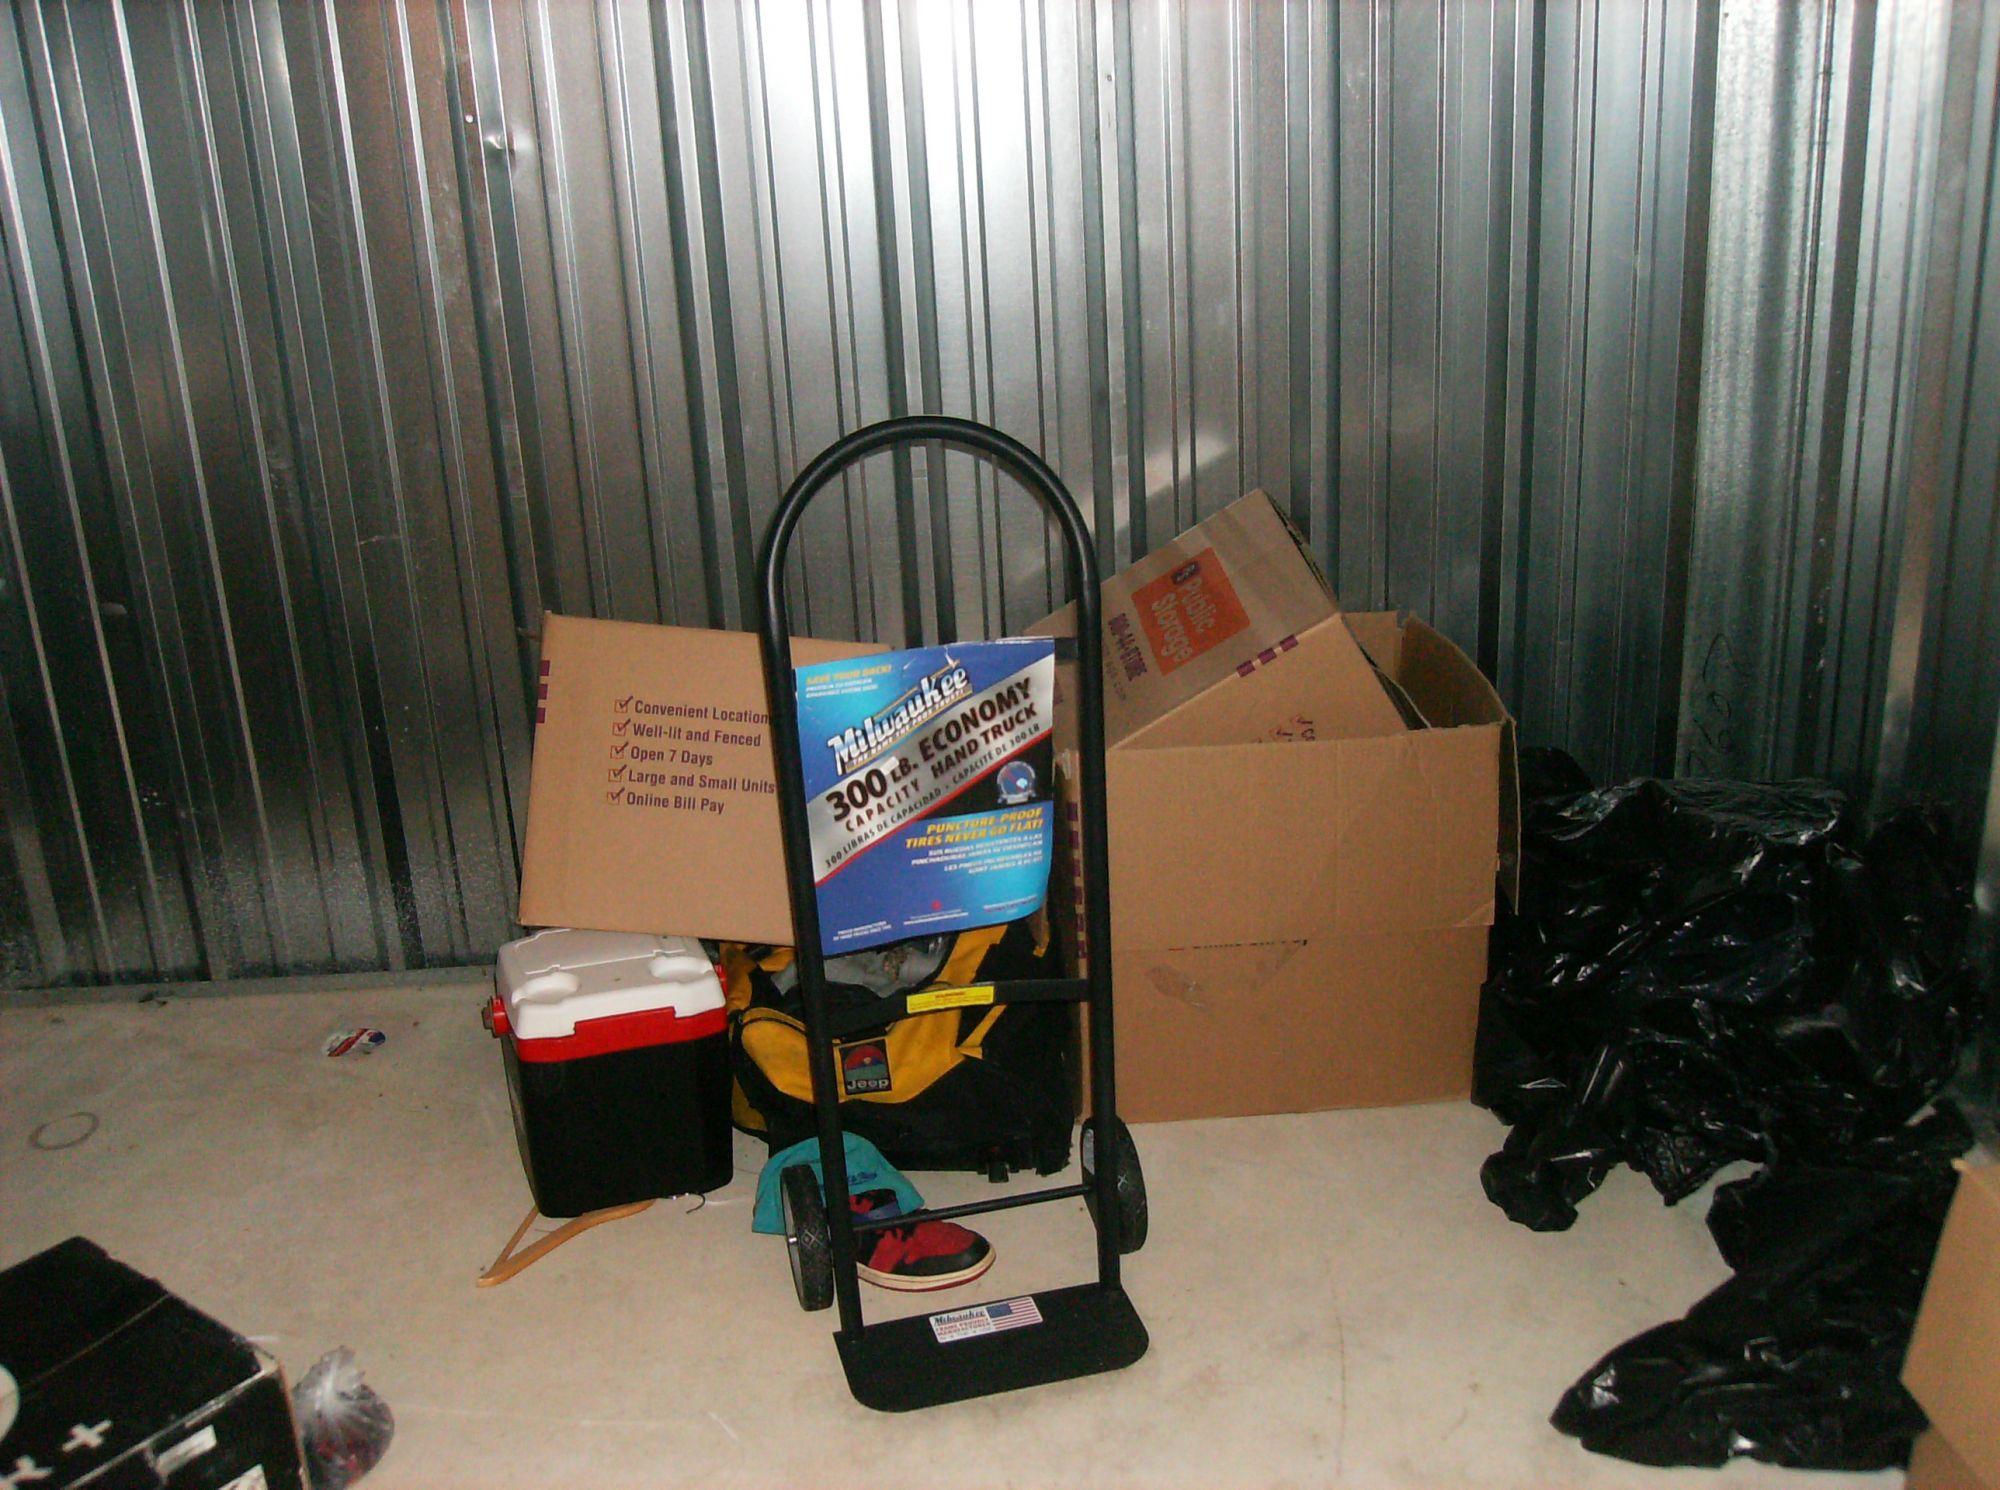 Storage Unit Auction 519545 East Bridgewater Ma & Storage Units Auction - Listitdallas